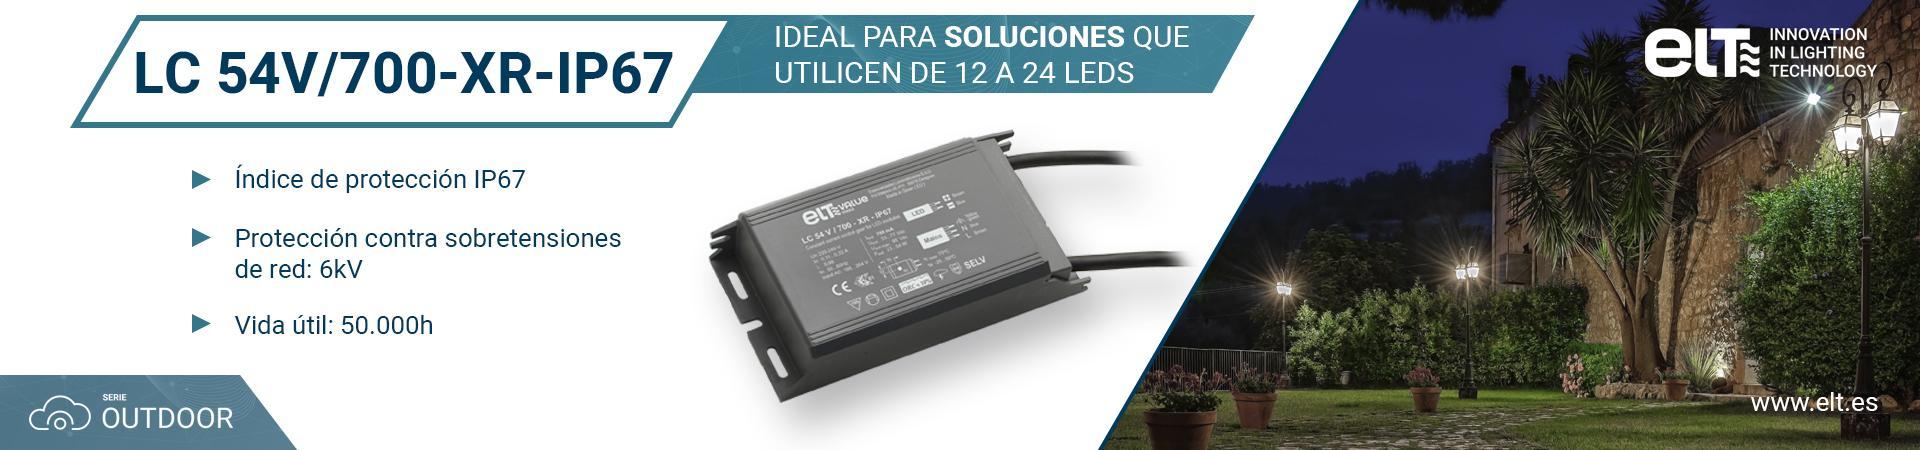 Innovation In Lighting Technology Elt Dali Led Driver Wiring Diagram For Lc Xr Ip67